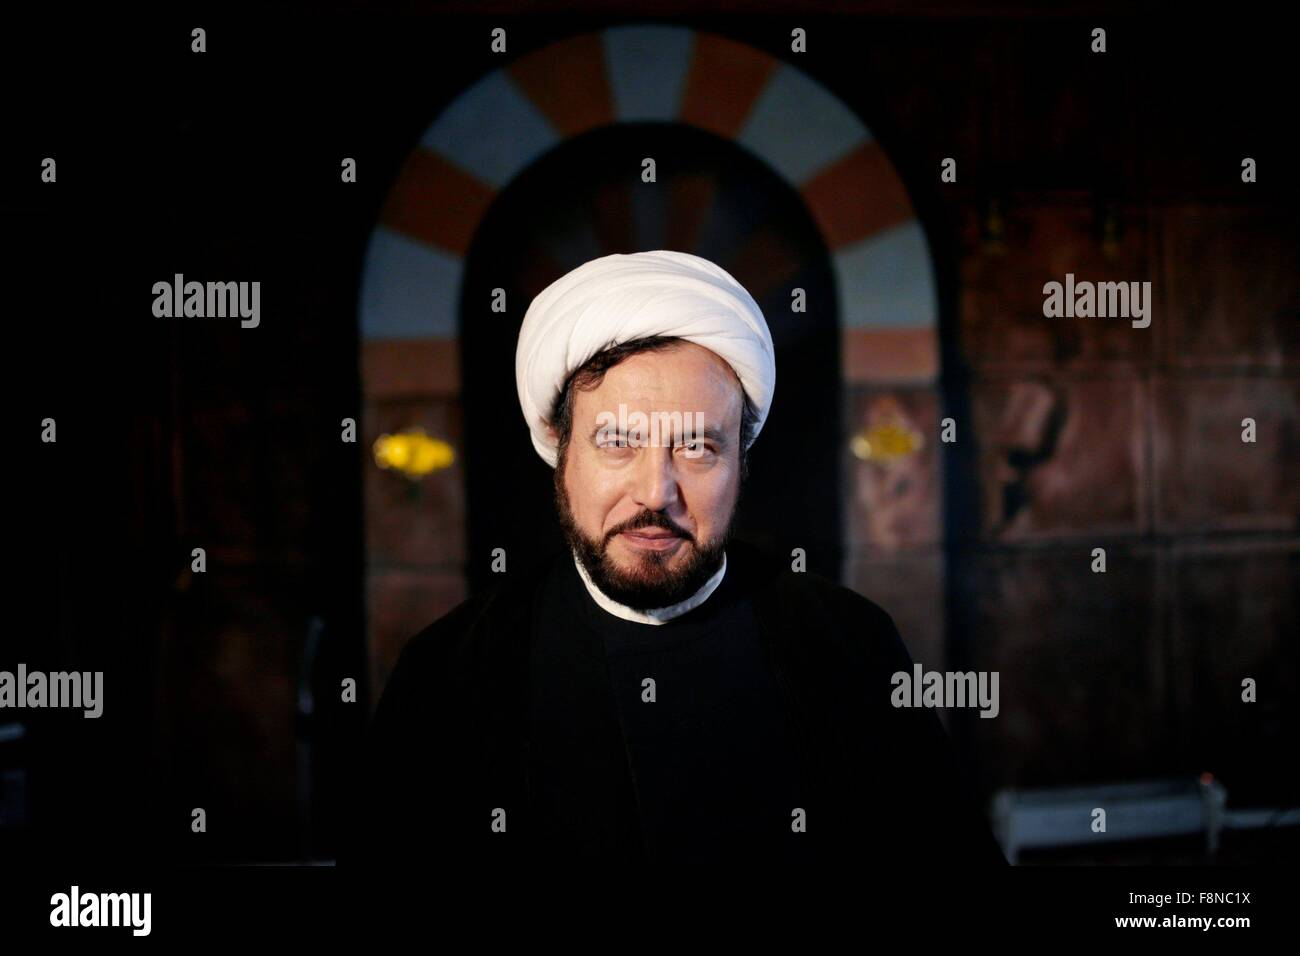 Islamic Center Of America, Michigan Stock Photos & Islamic